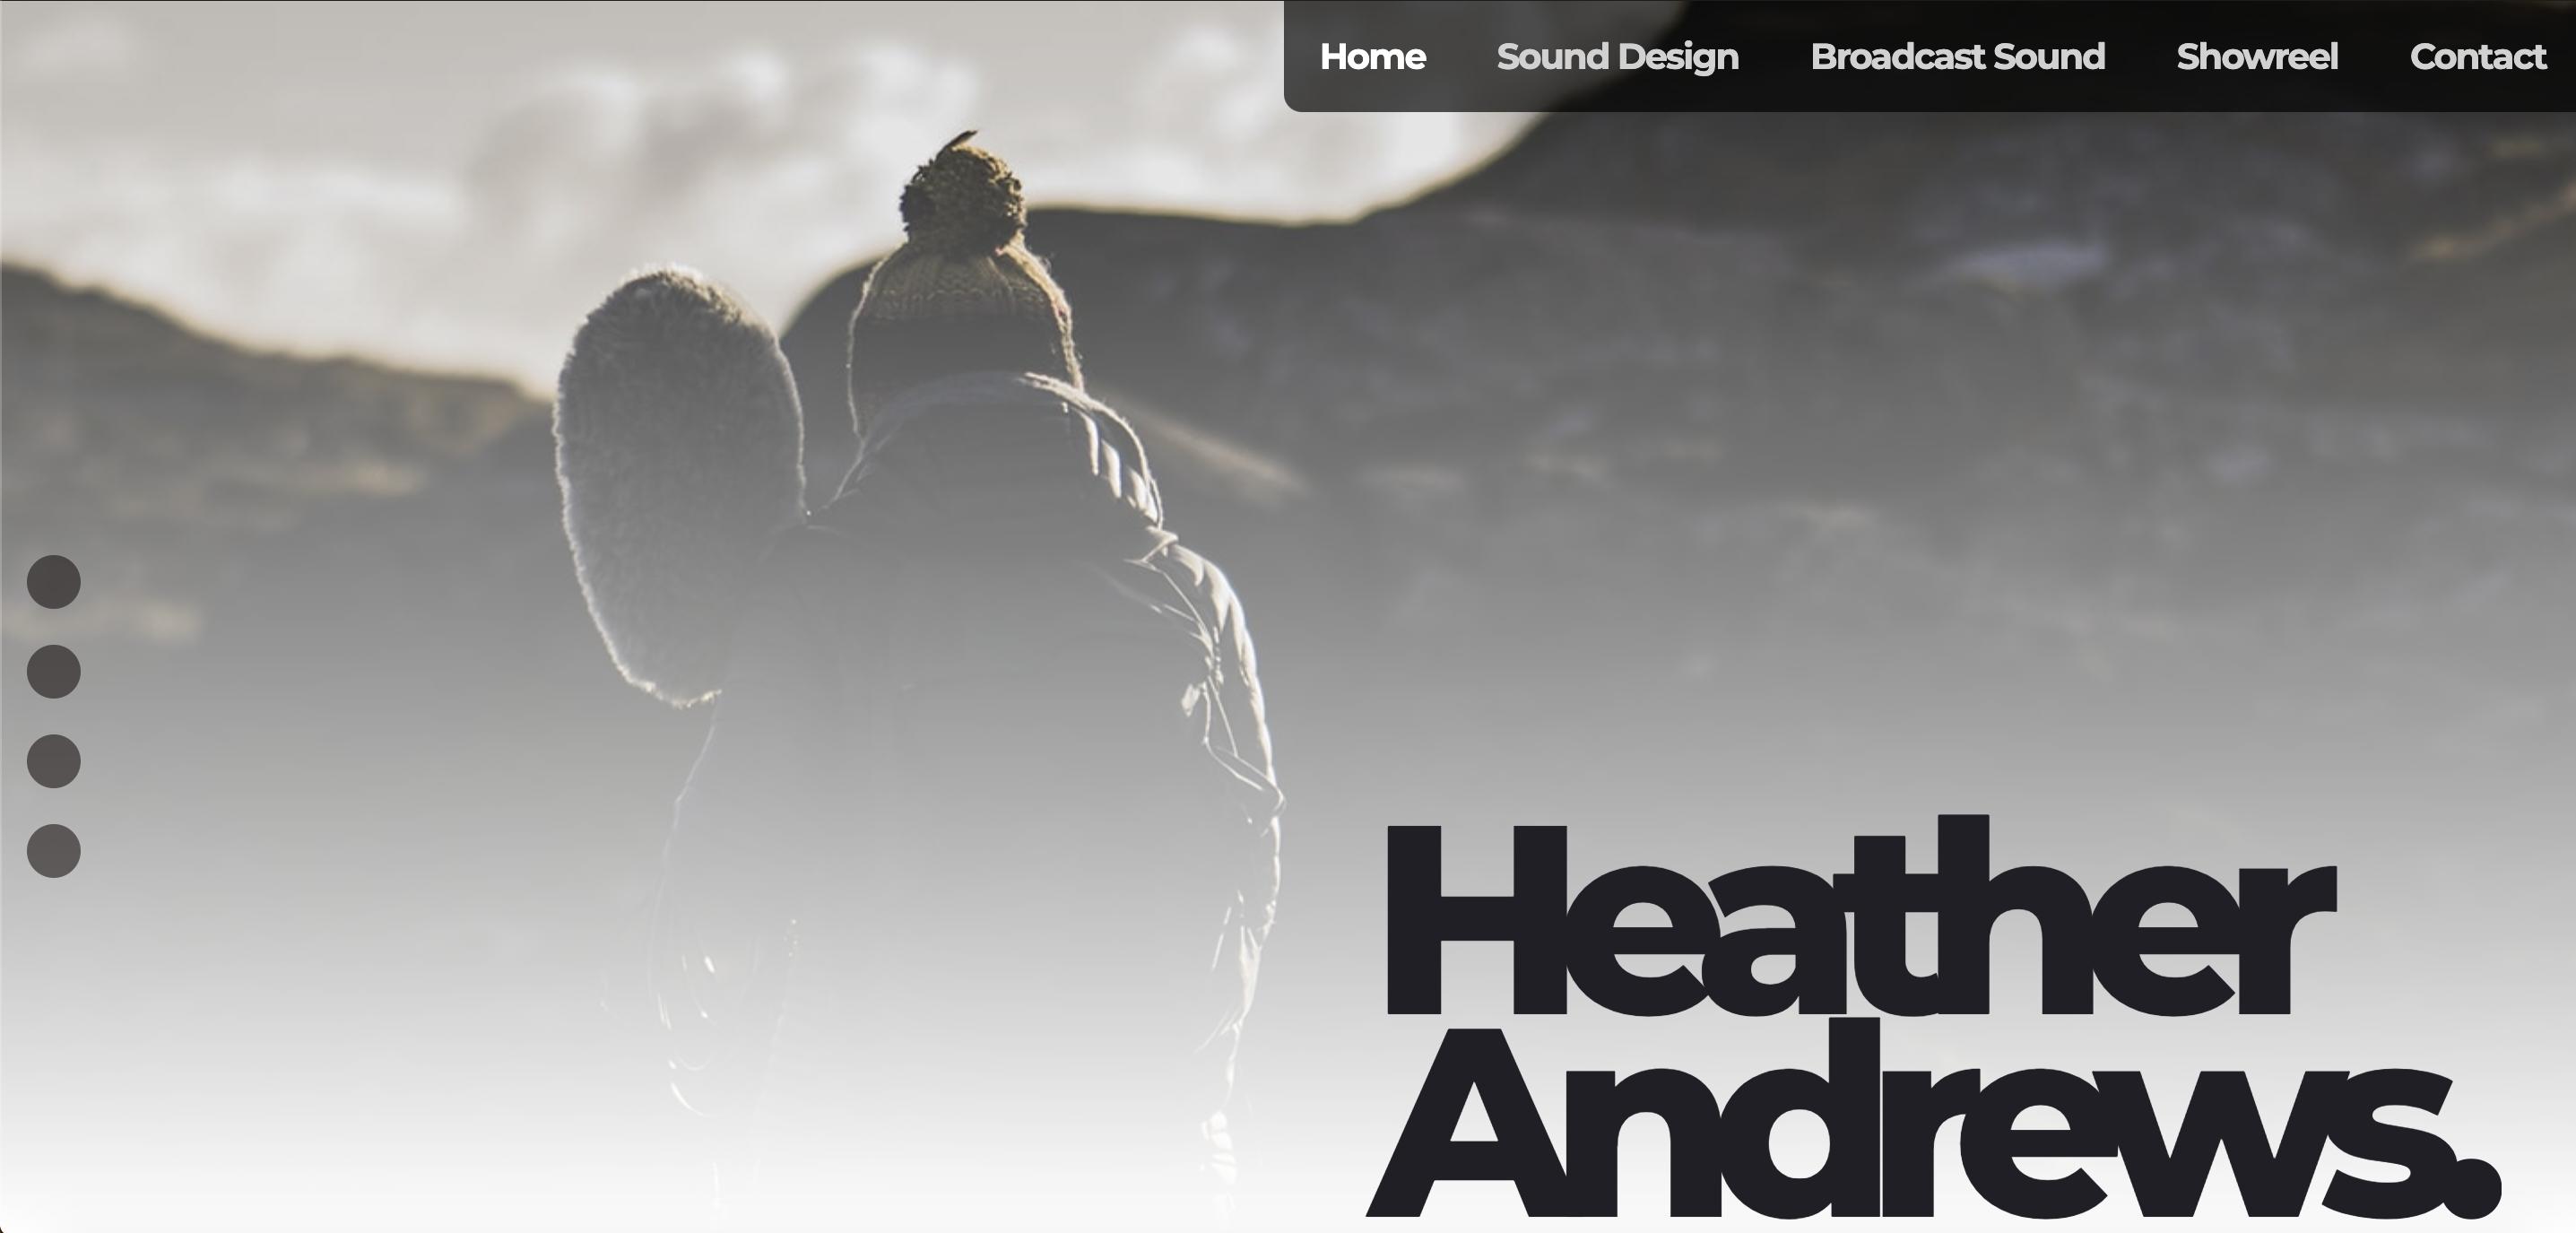 An image of the website design for Heather Andrews Sound Engineer & designer